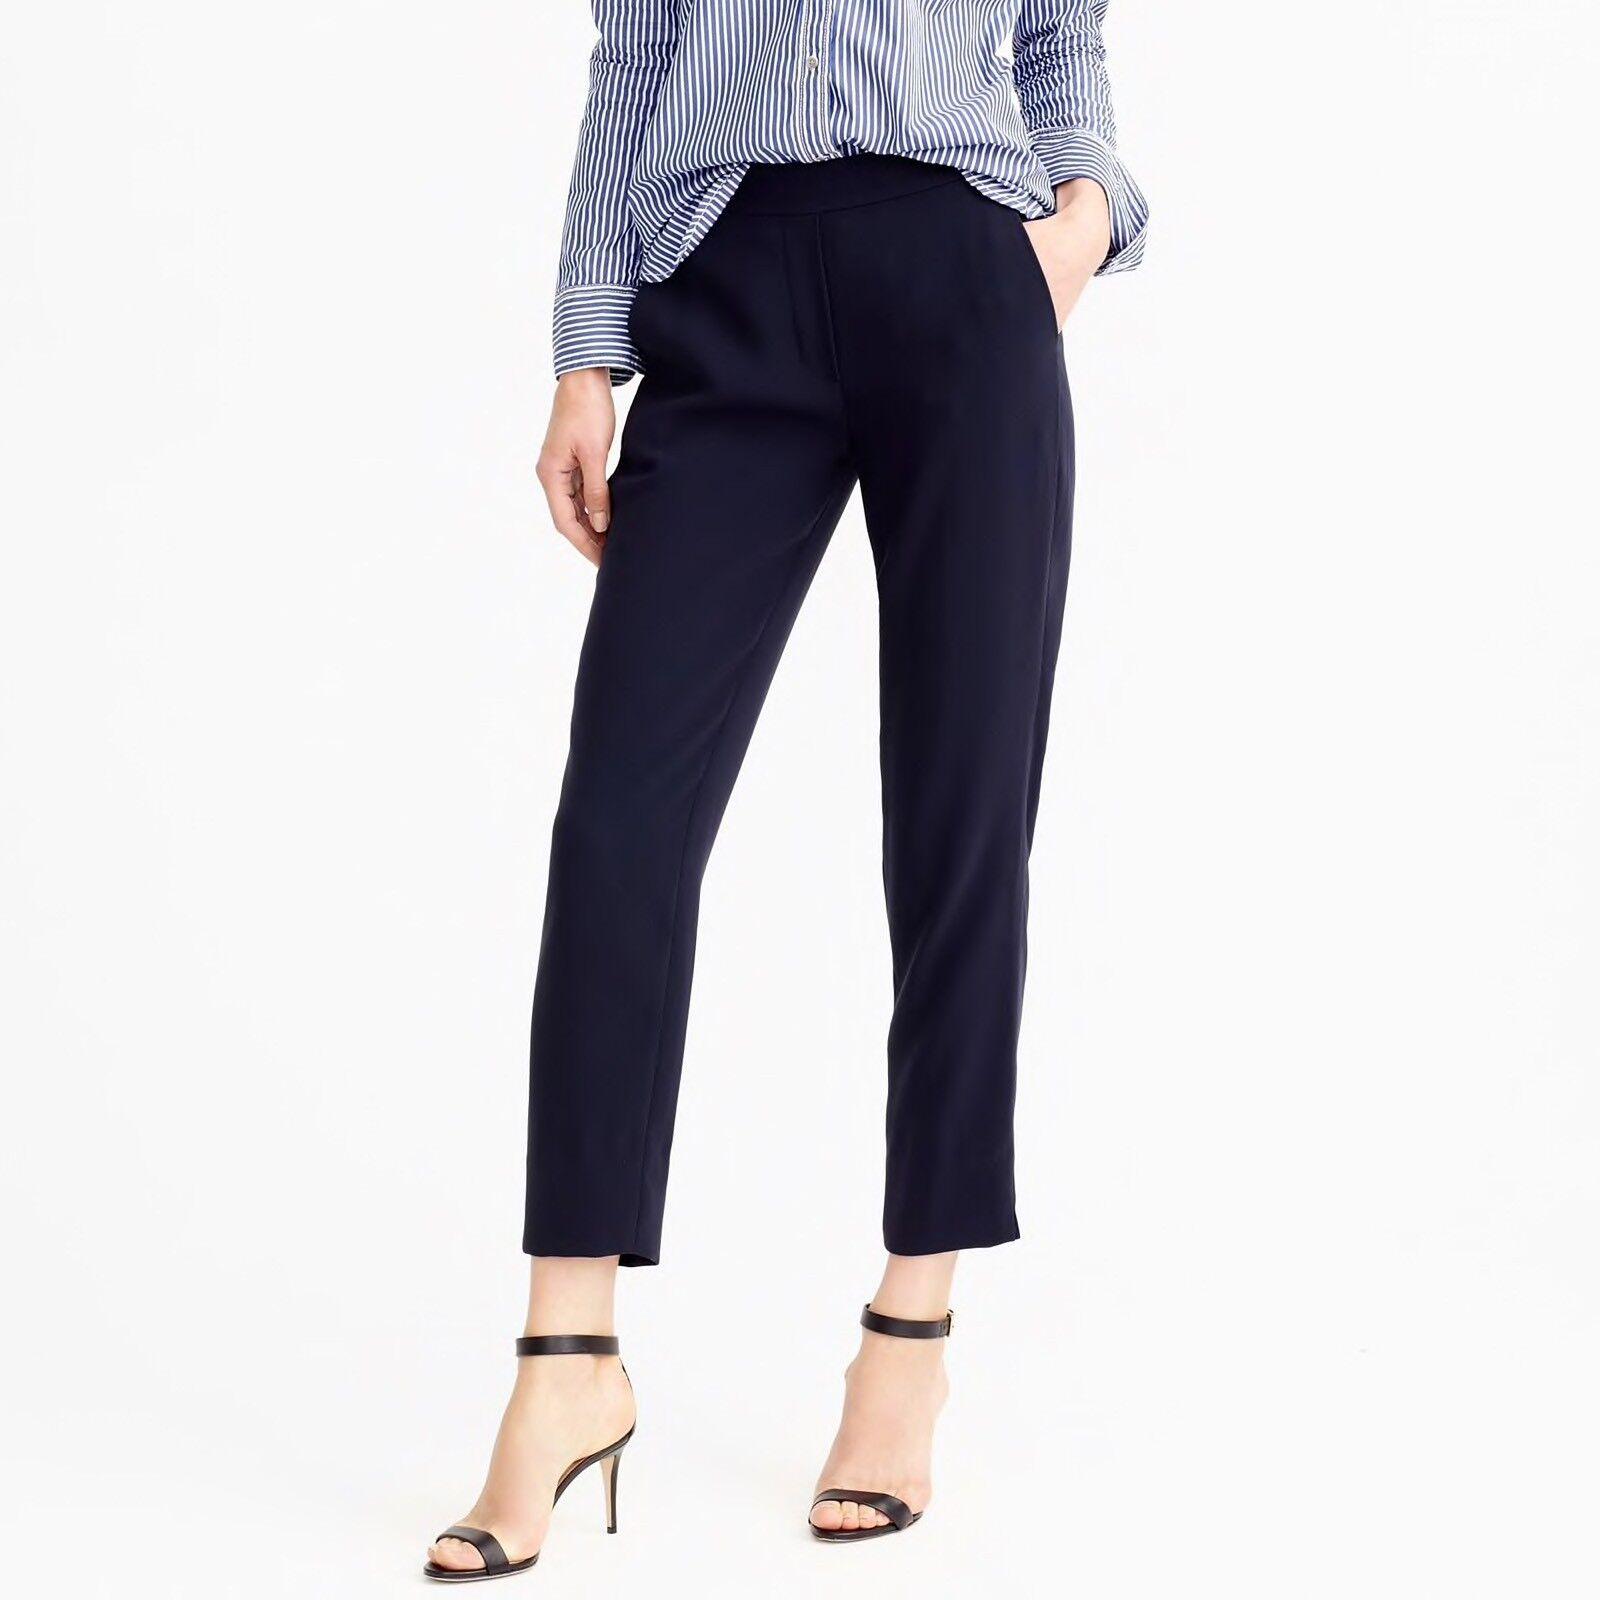 110 J.CREW Size 00 Easy Pant NAVY Style E1756